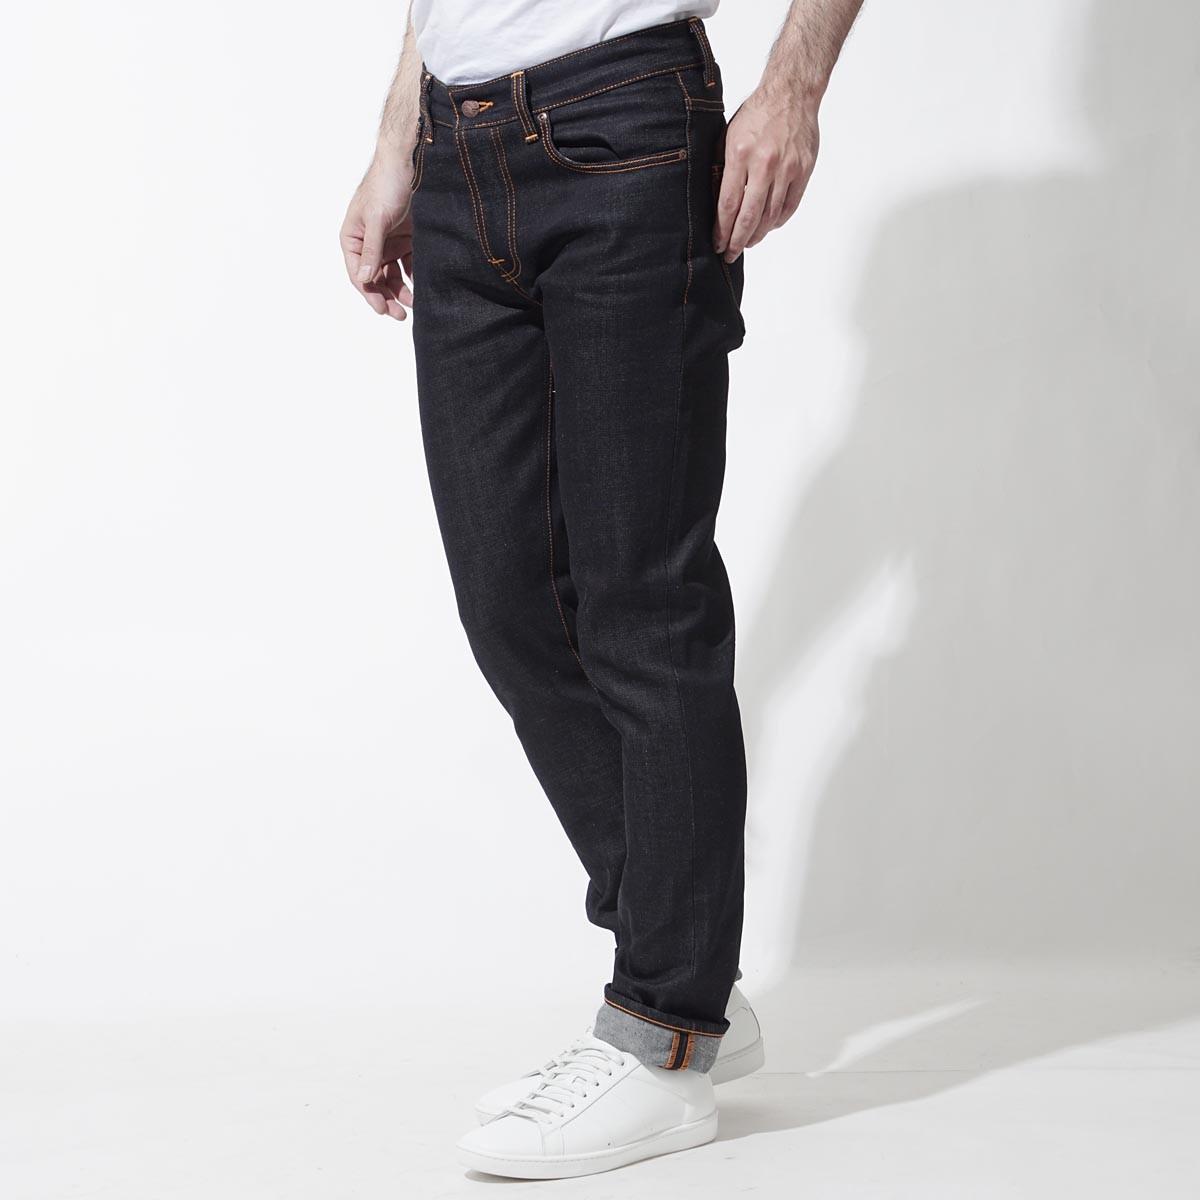 Nudie Jeans GRIM TIM 男士牛仔裤